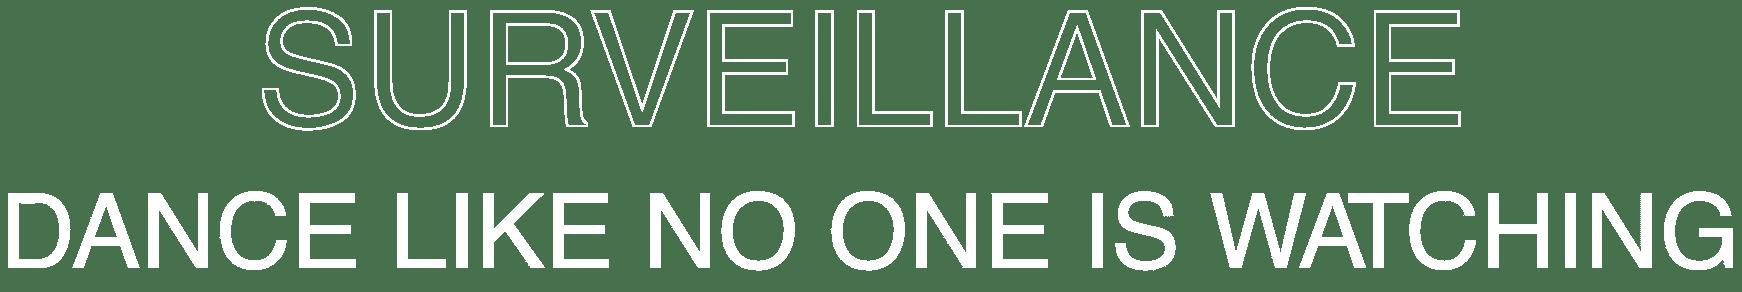 surveillance logo